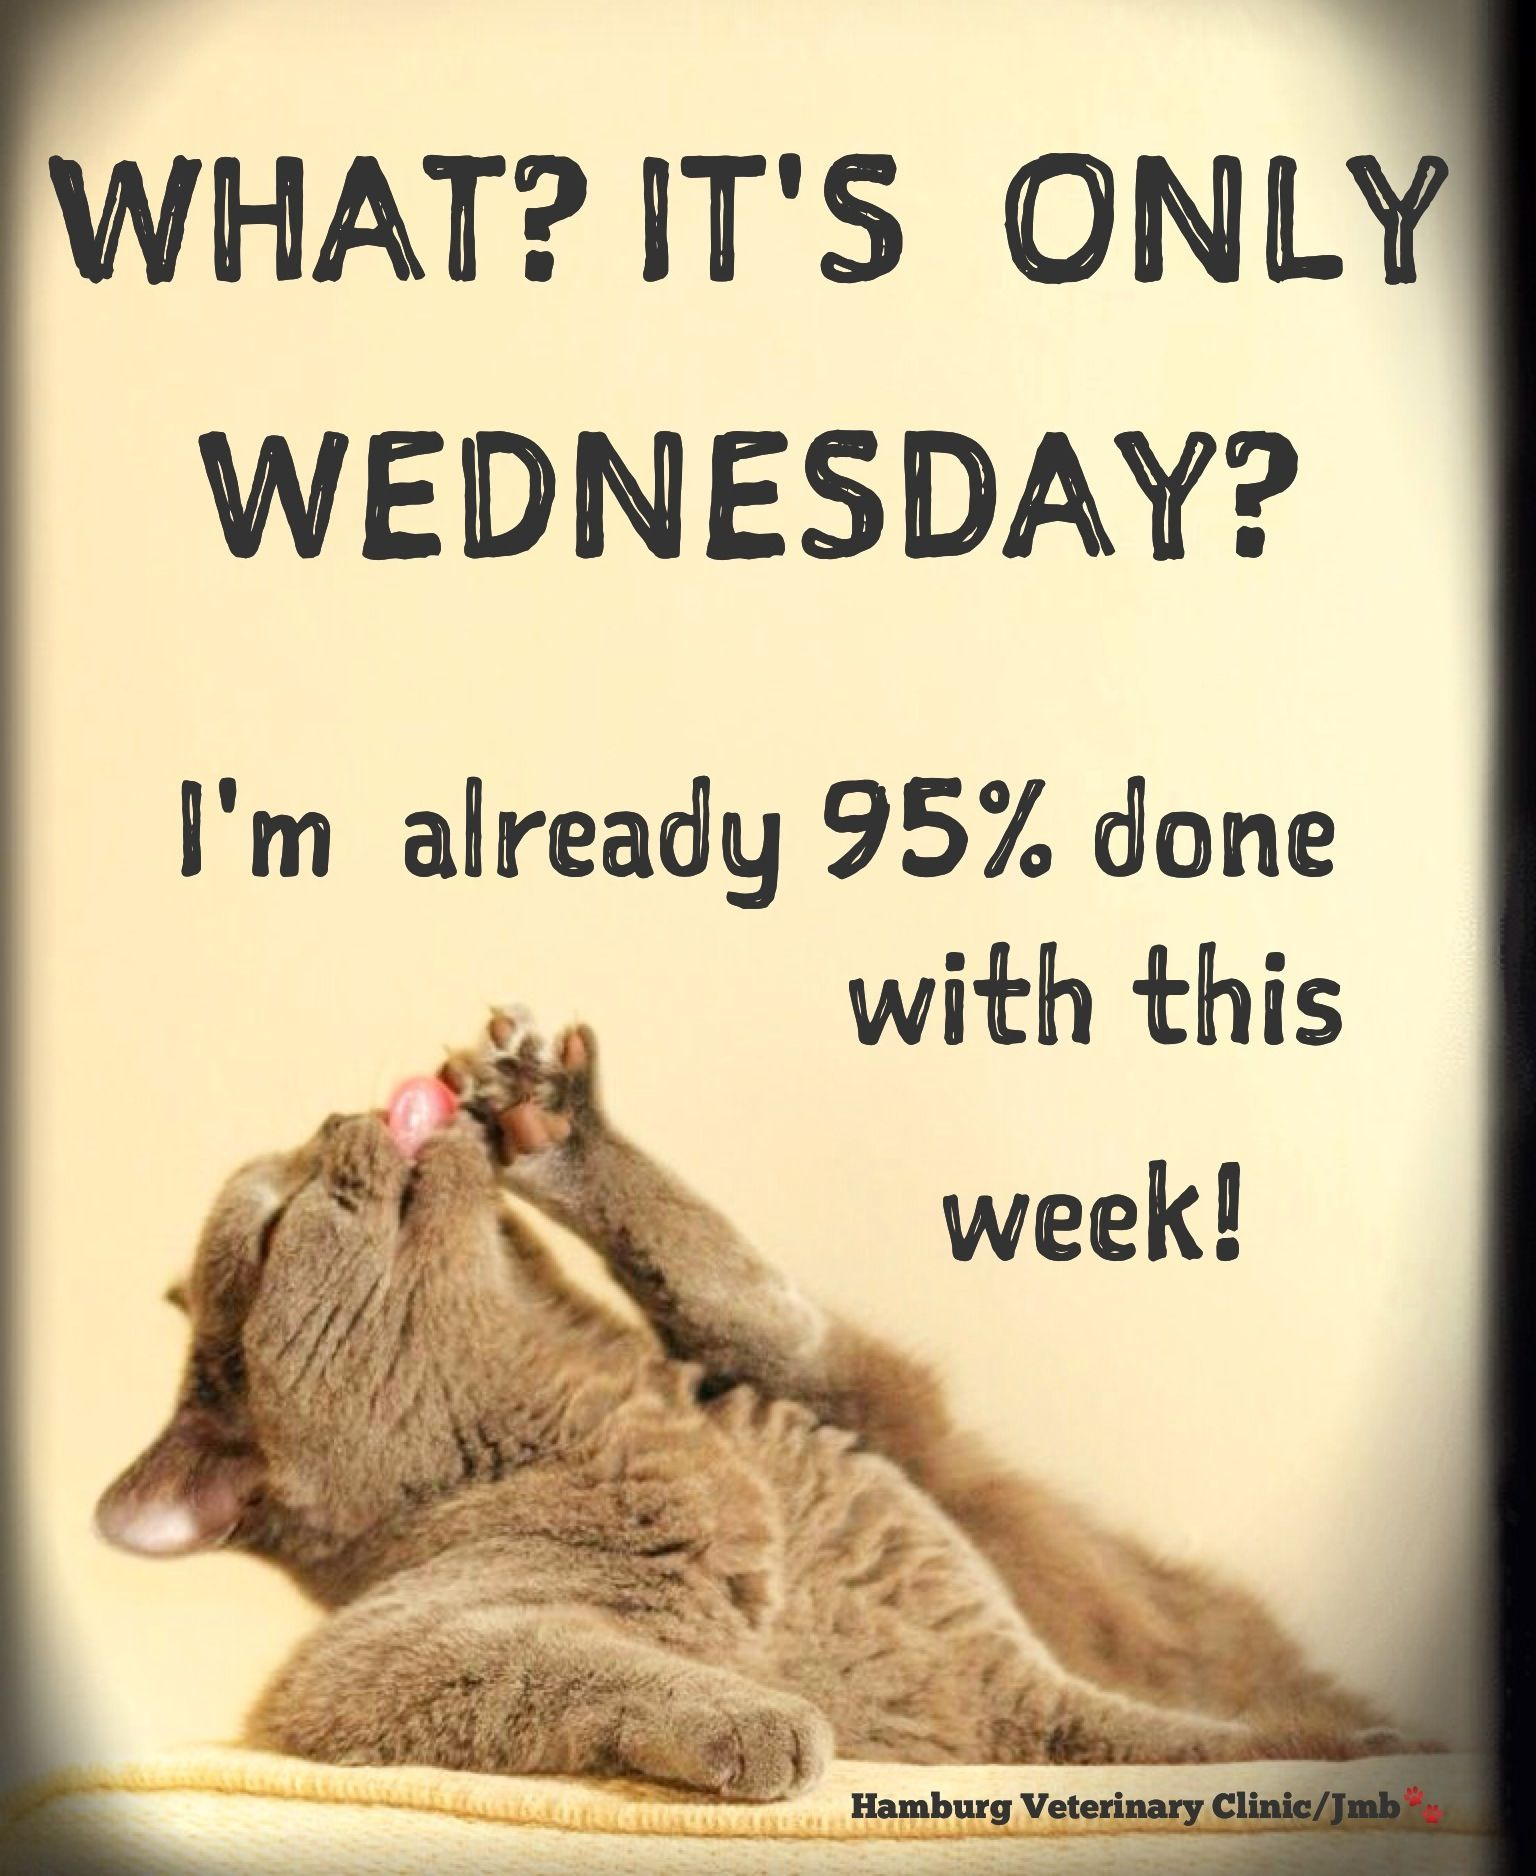 Wednesday Morning Funny : wednesday, morning, funny, Wednesday, Humor, Happy, Week:, Halfway, There!, Animal, Cute:, What?, Wednesday?, Morning, Quotes,, Quotes, Funny